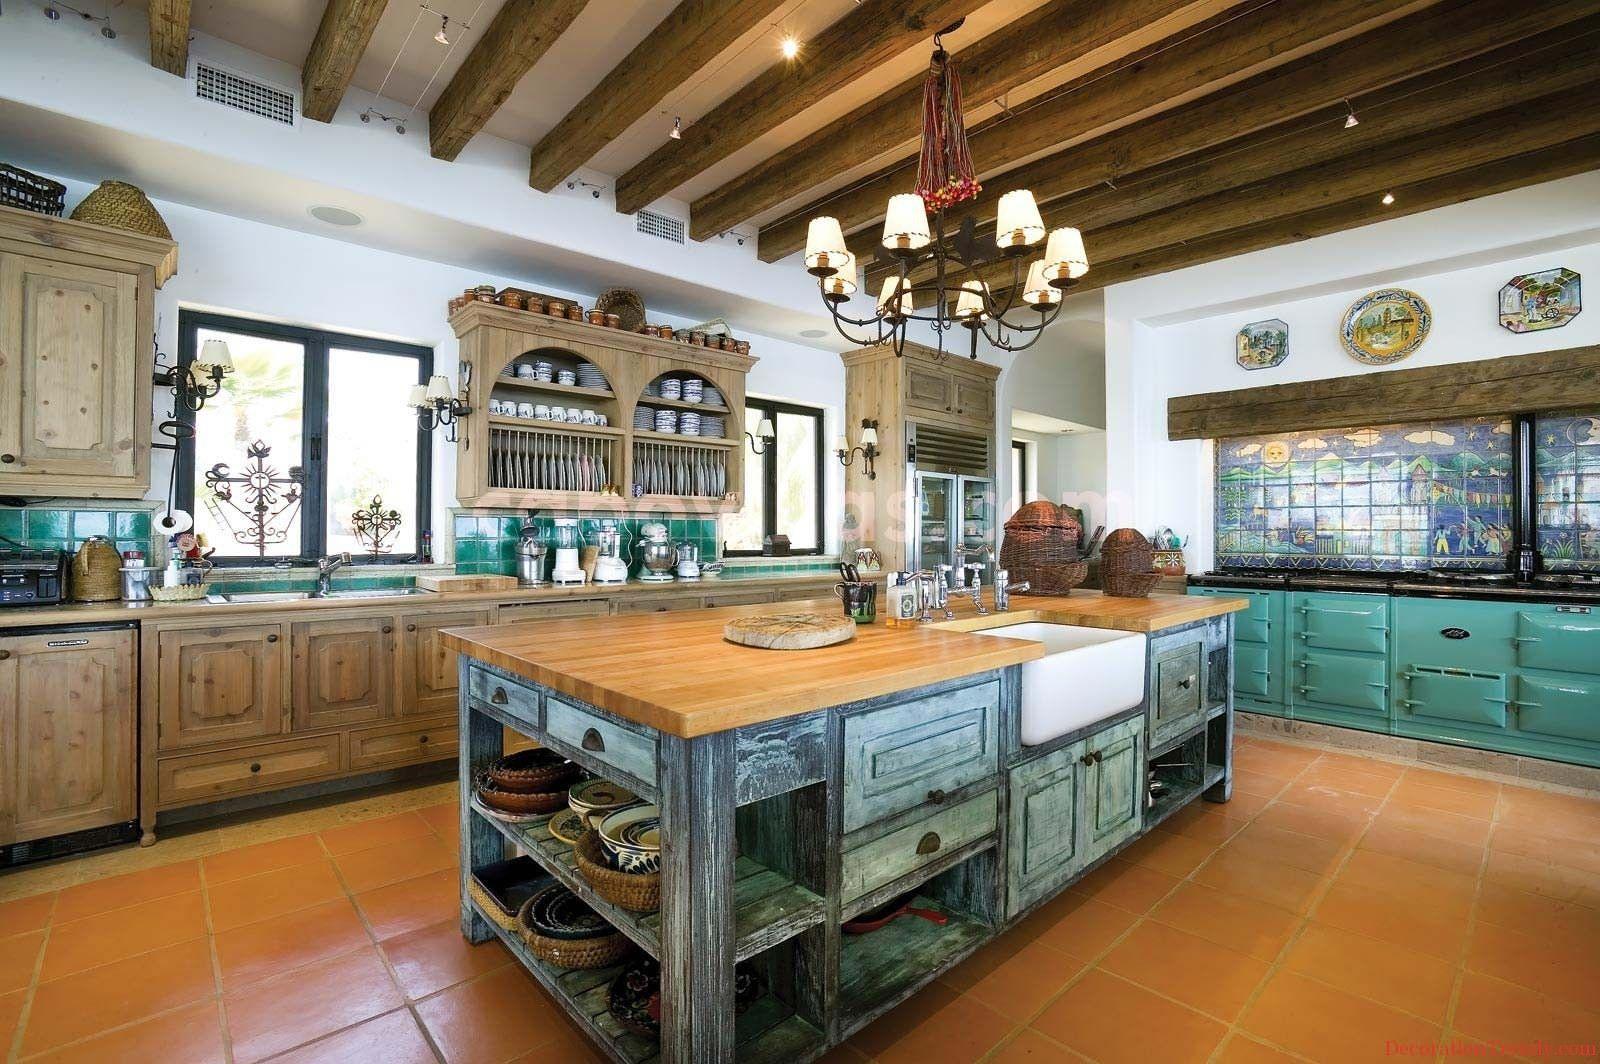 20 Fabulous Shades Of Orange Paint And Furnishings Mexican Kitchen Decor Yellow Kitchen Decor Kitchen Decor